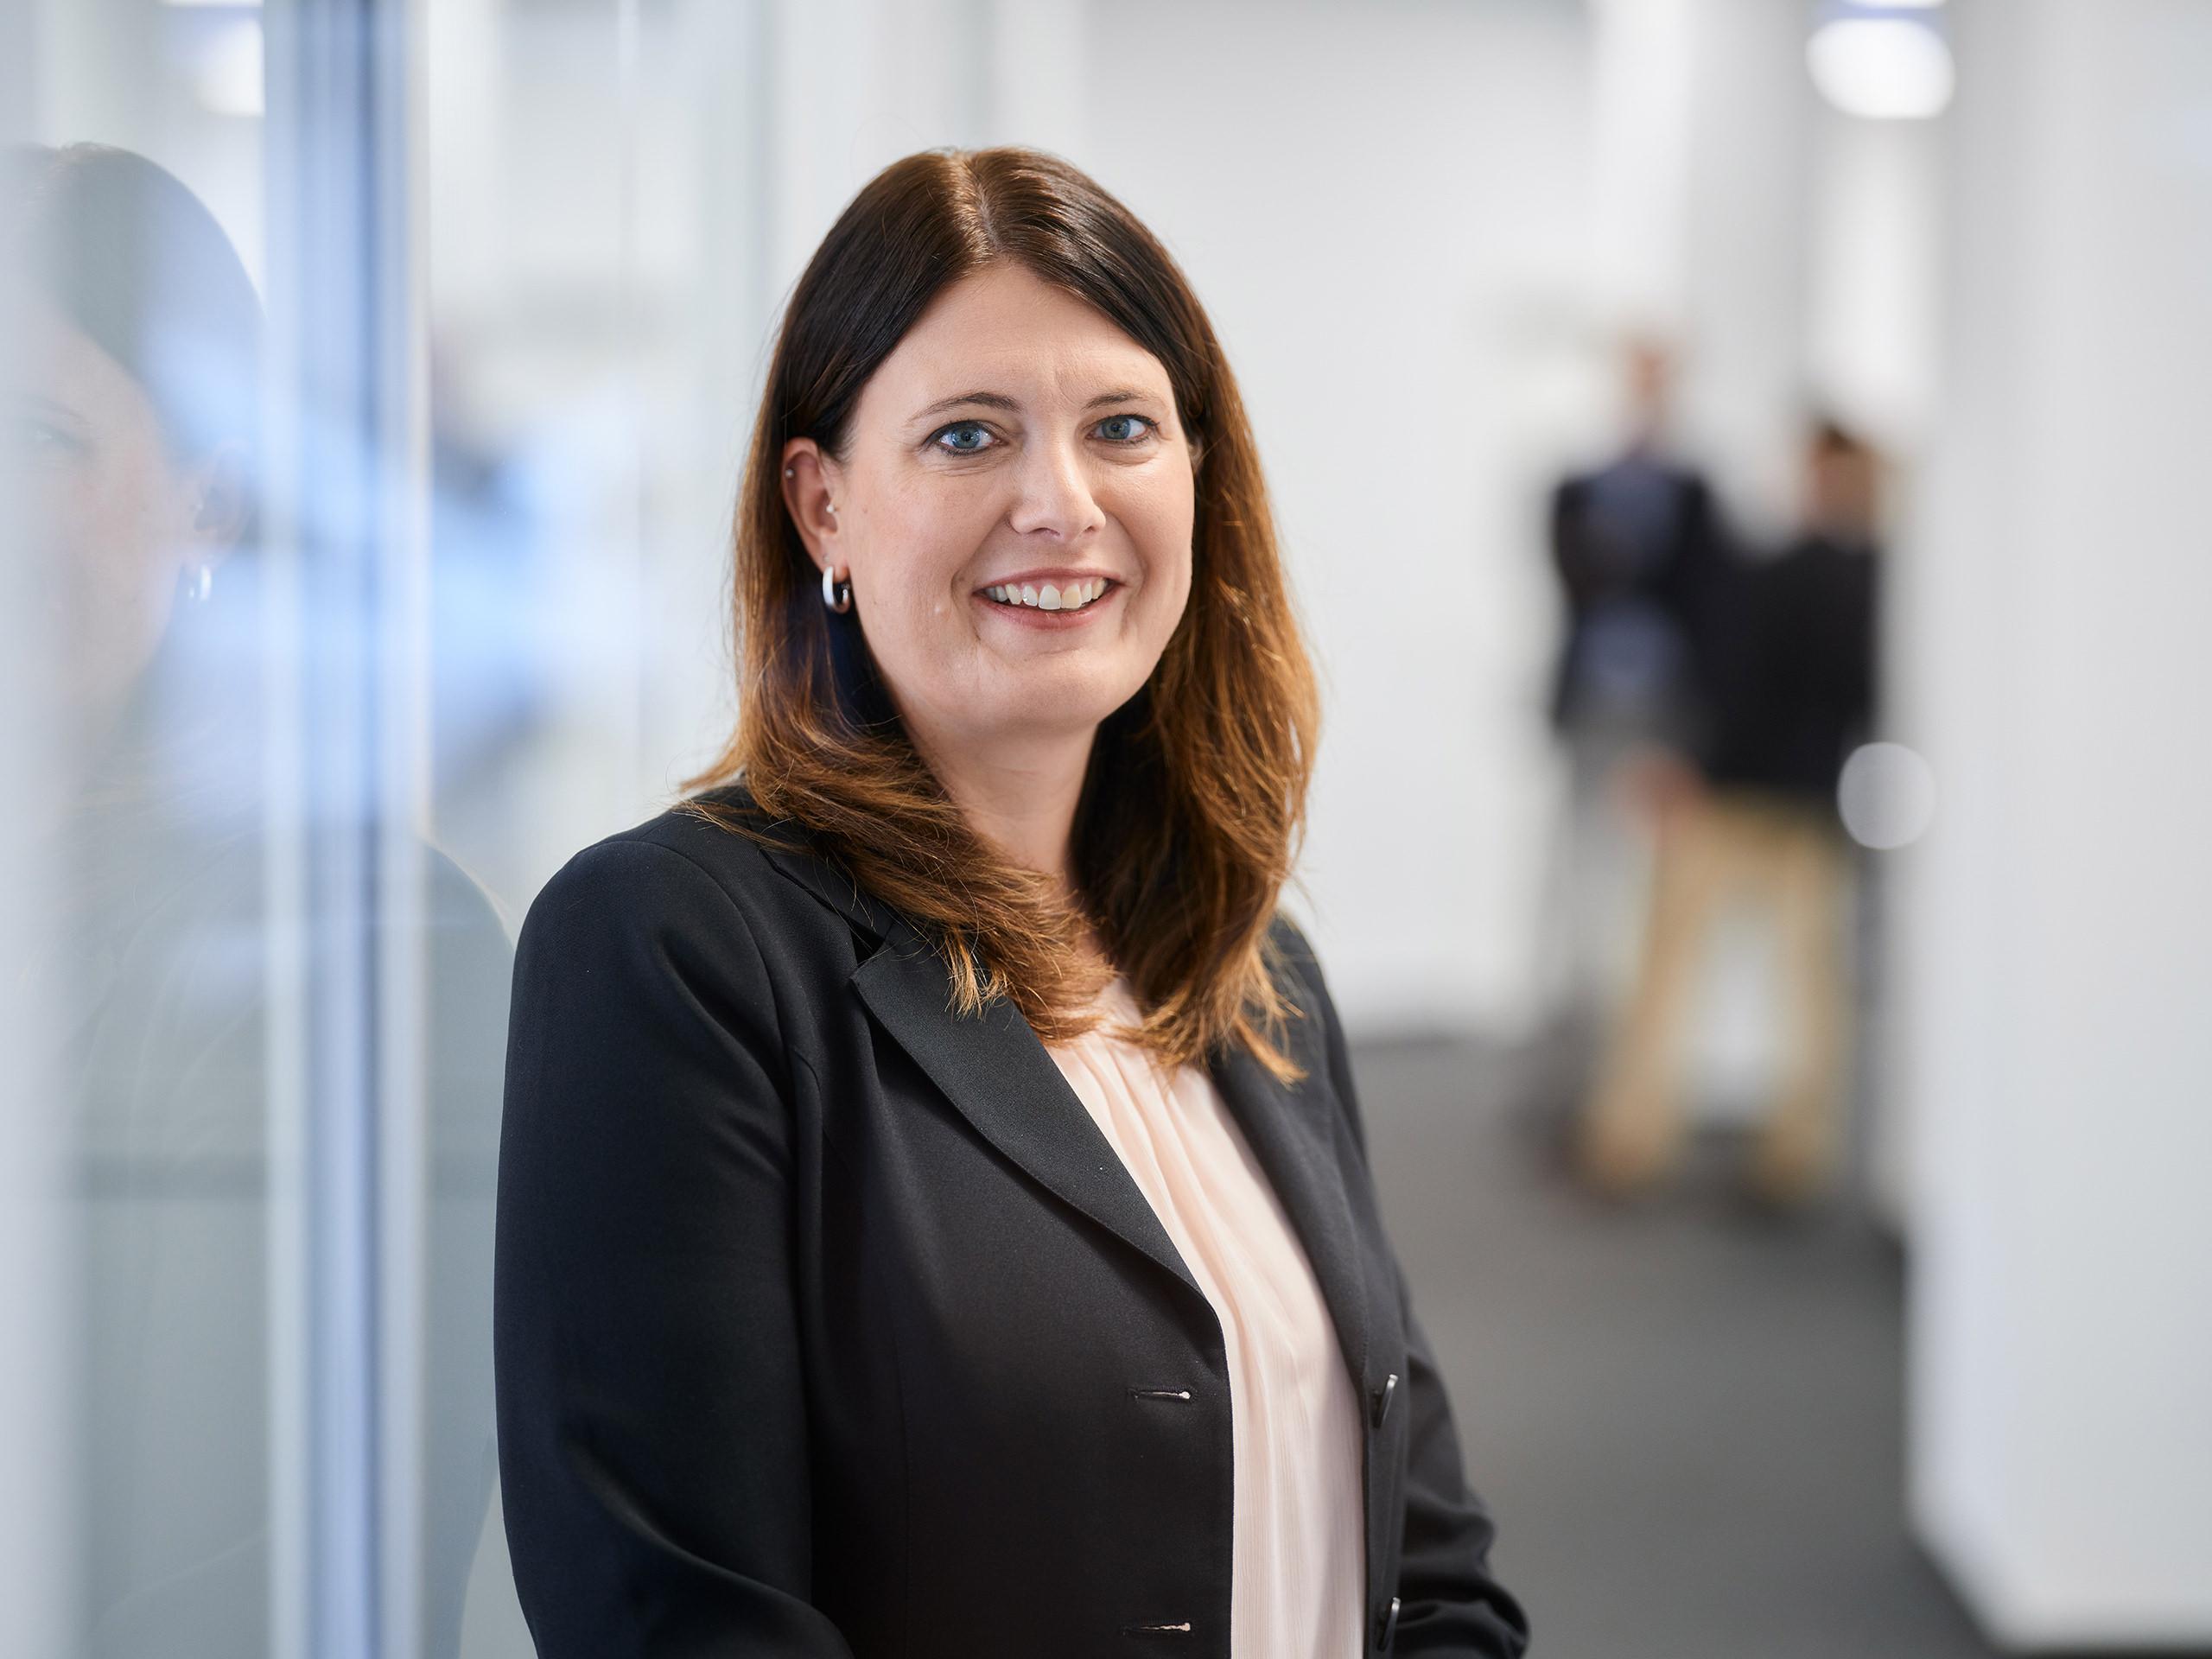 Ulrike Brenner, Hauptsekretariat